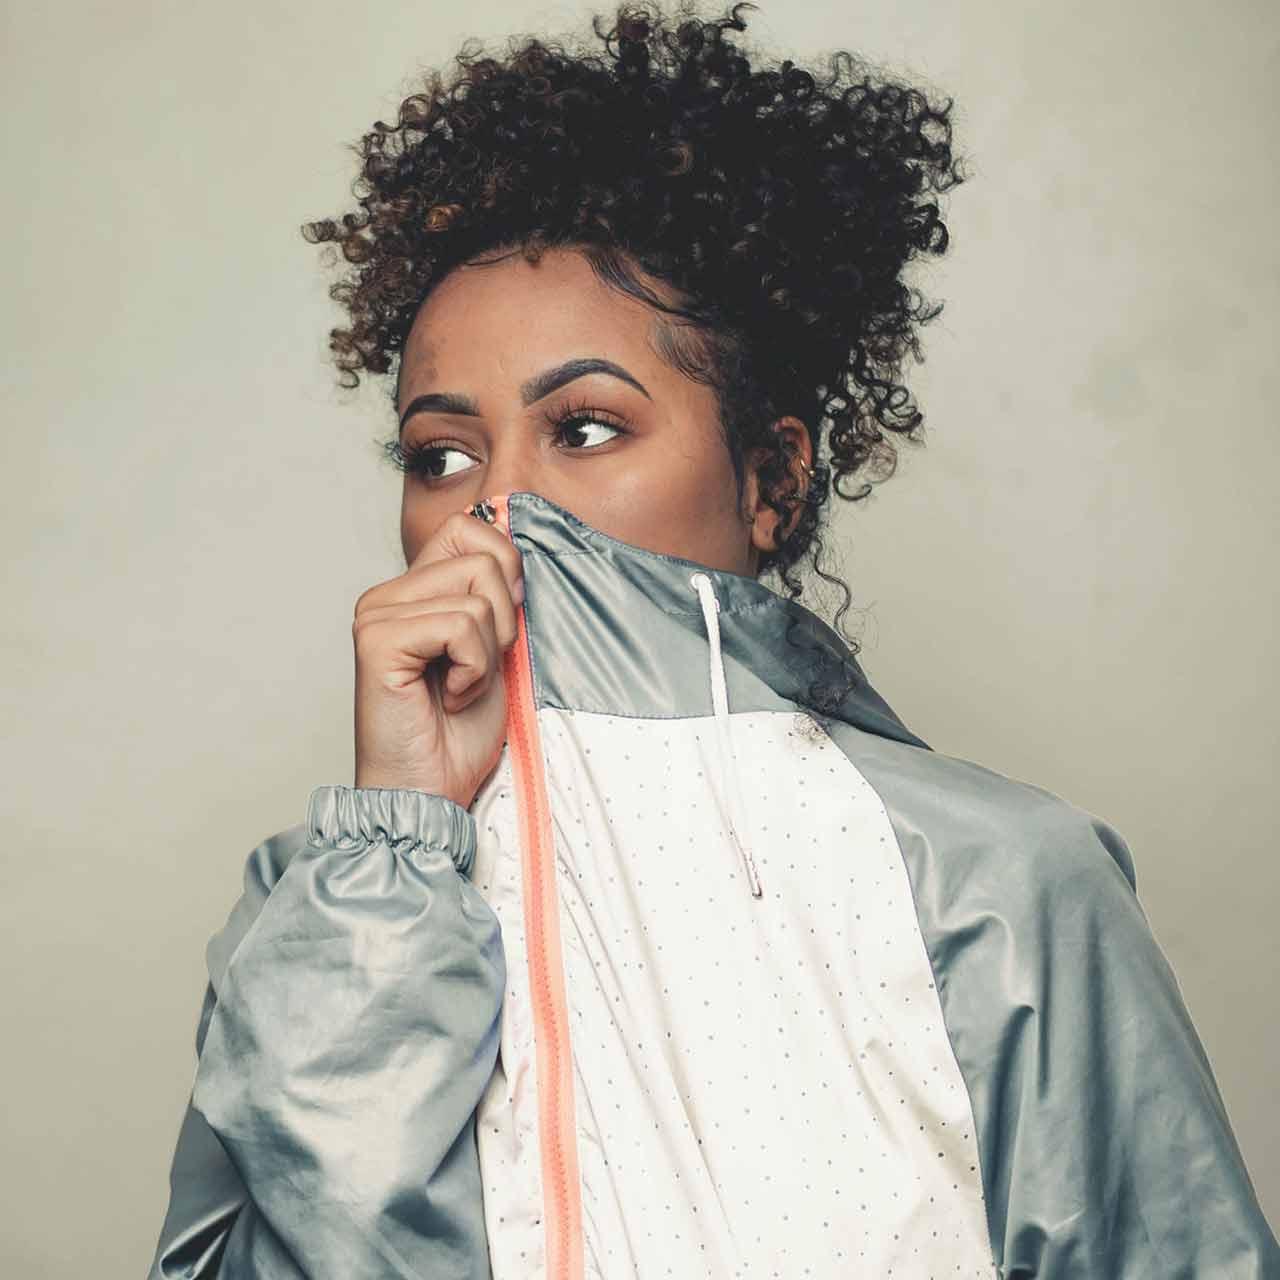 woman-wearing-zip-up-jacket-2576729